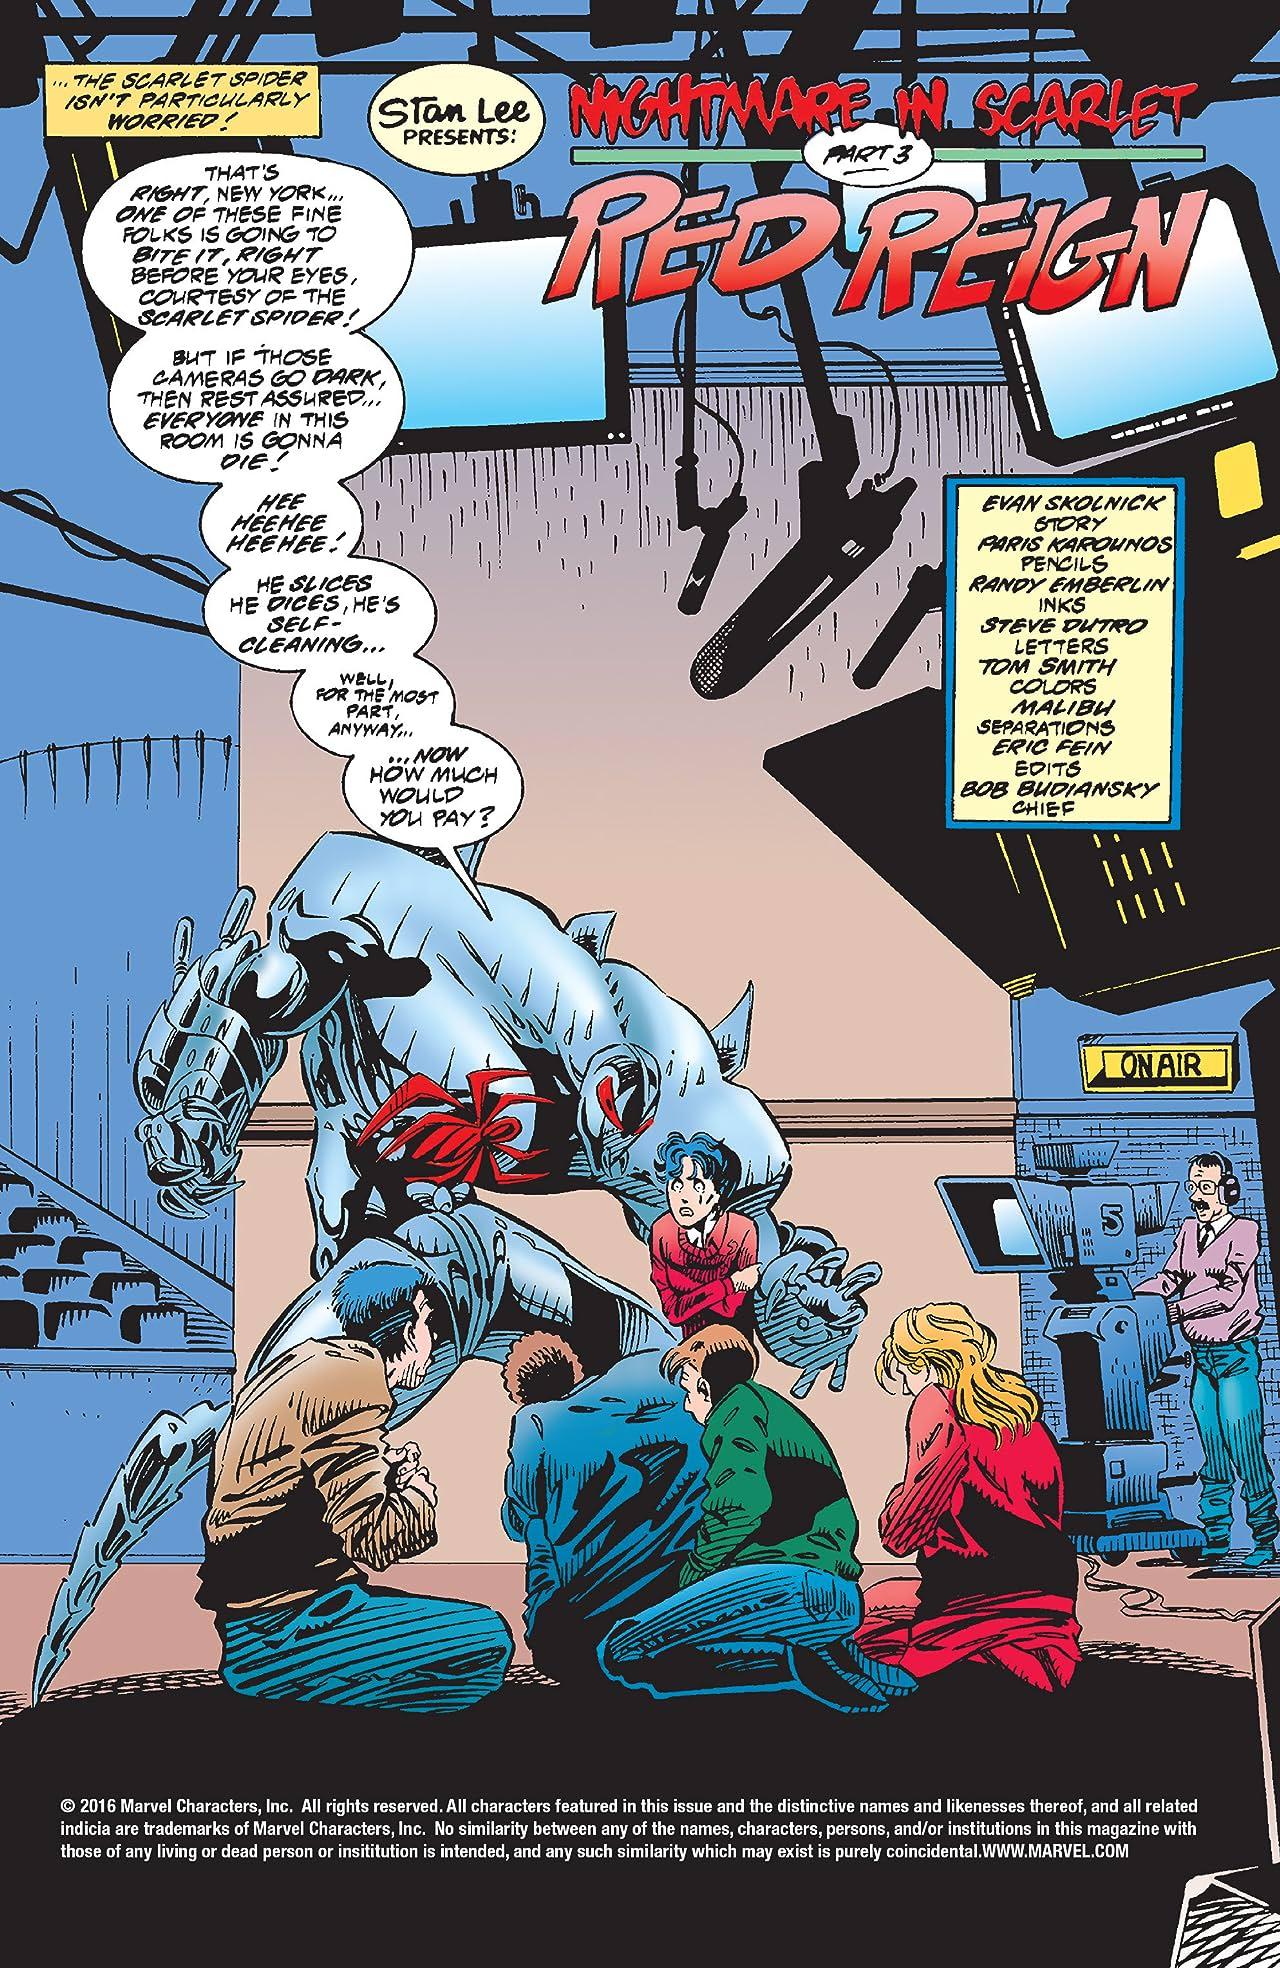 Web of Scarlet Spider (1995-1996) #4 (of 4)